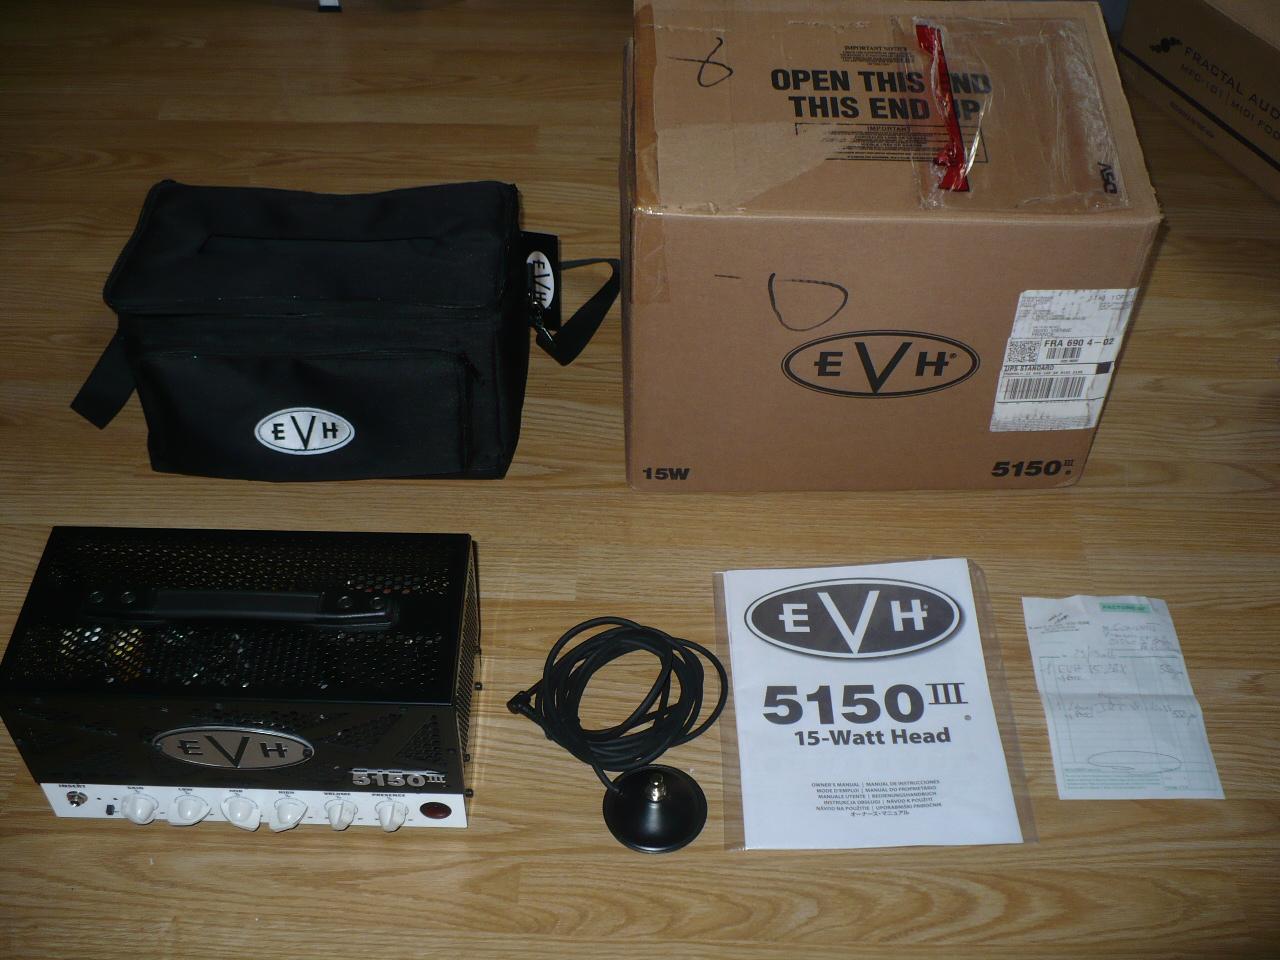 evh 5150 iii lbx manual